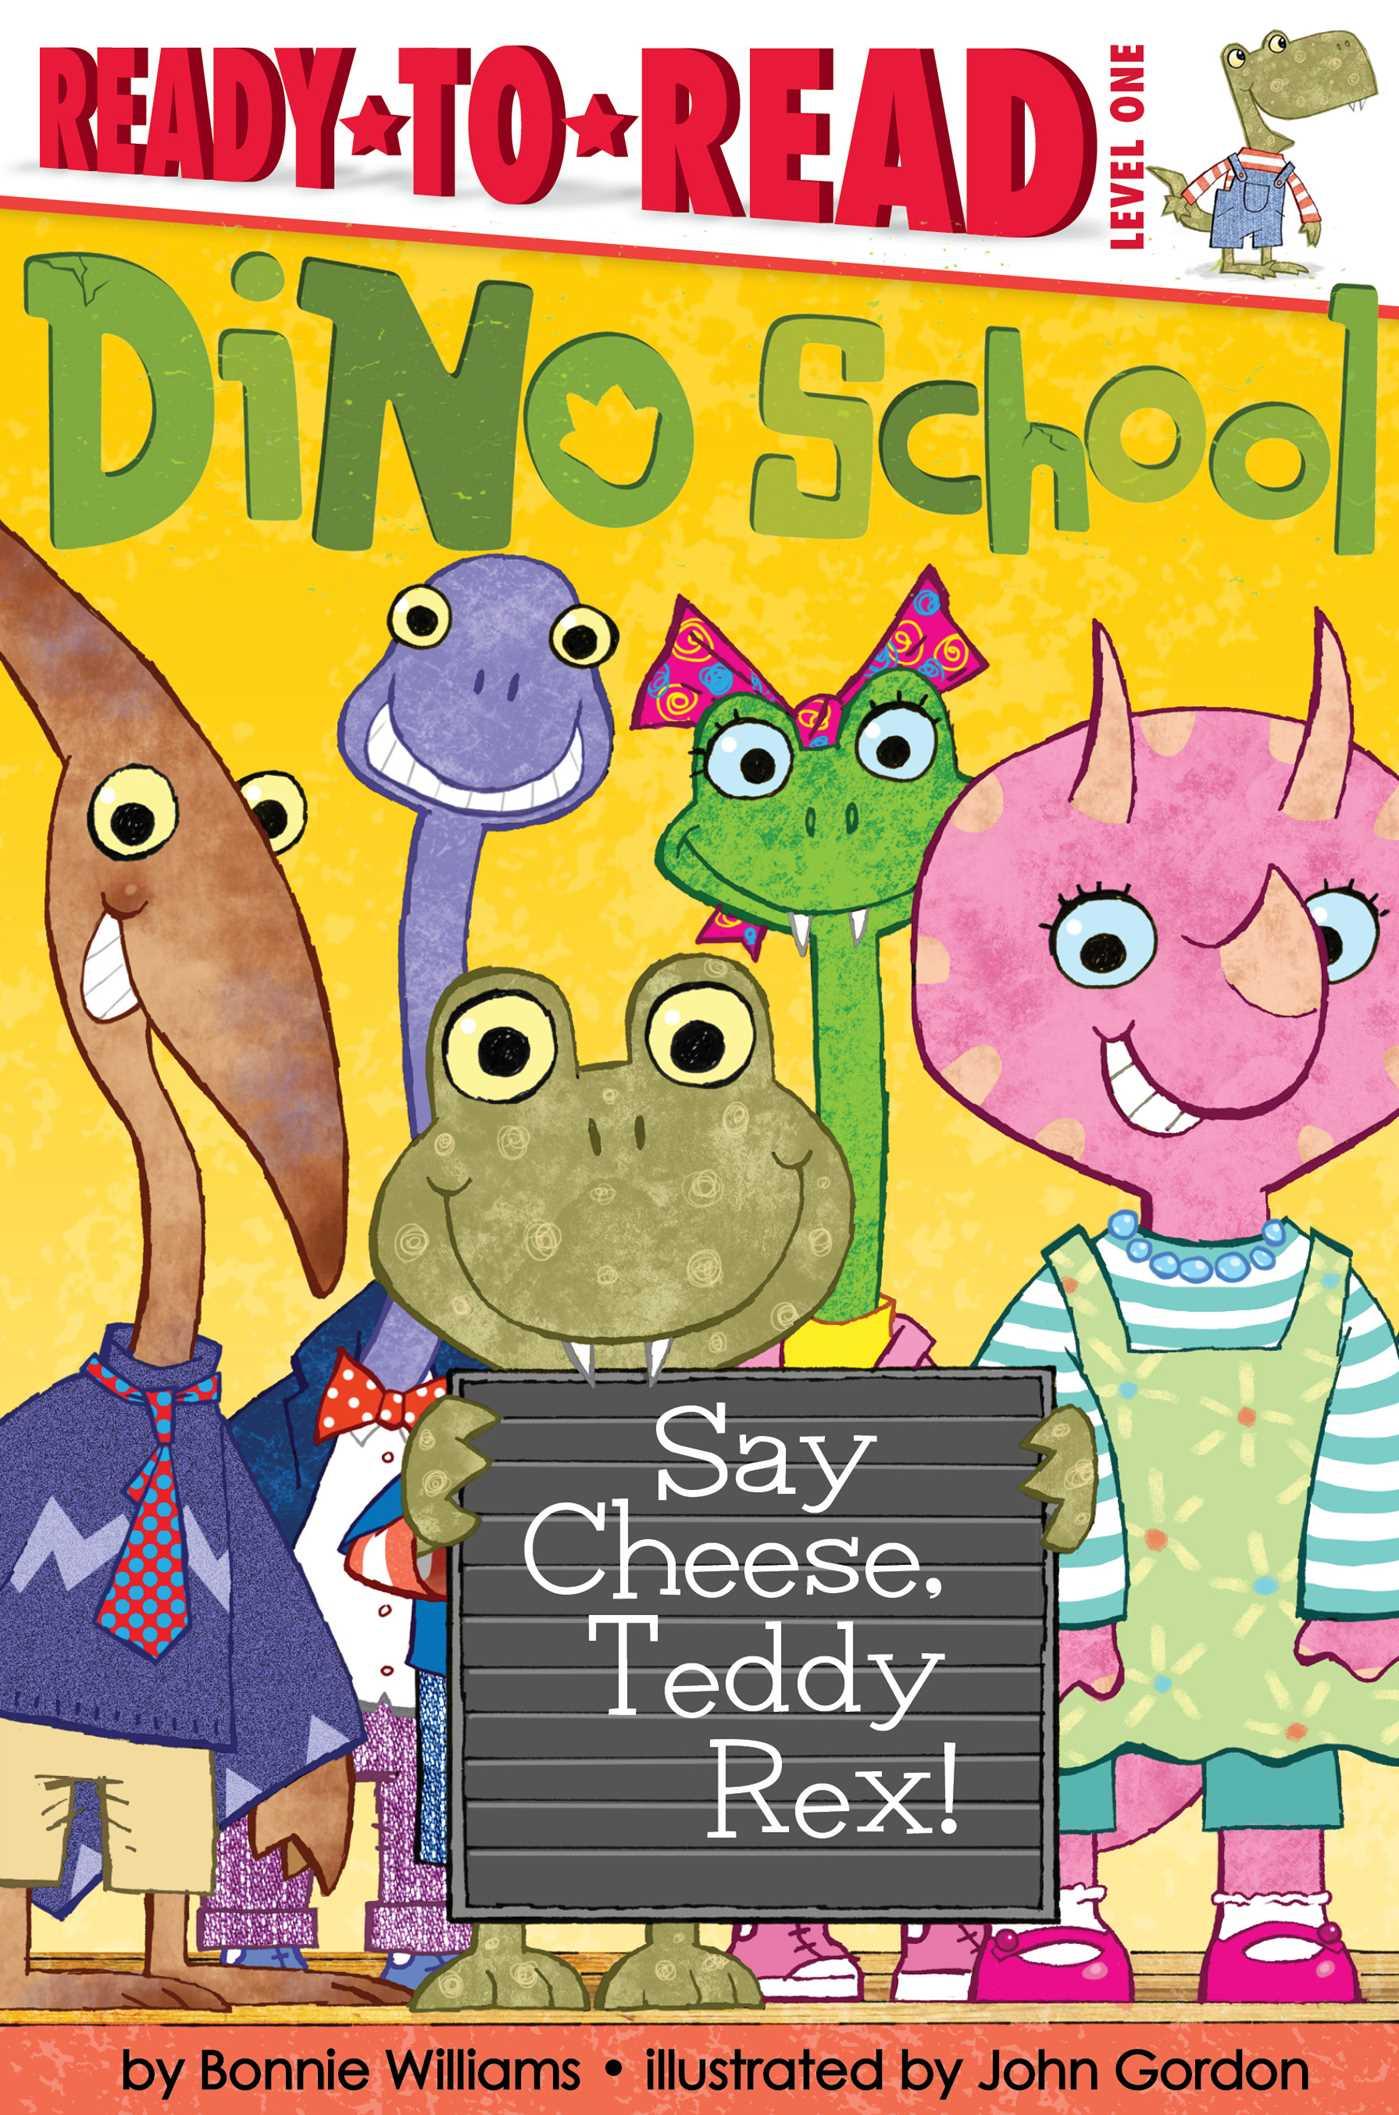 Say cheese teddy rex 9781481466097 hr